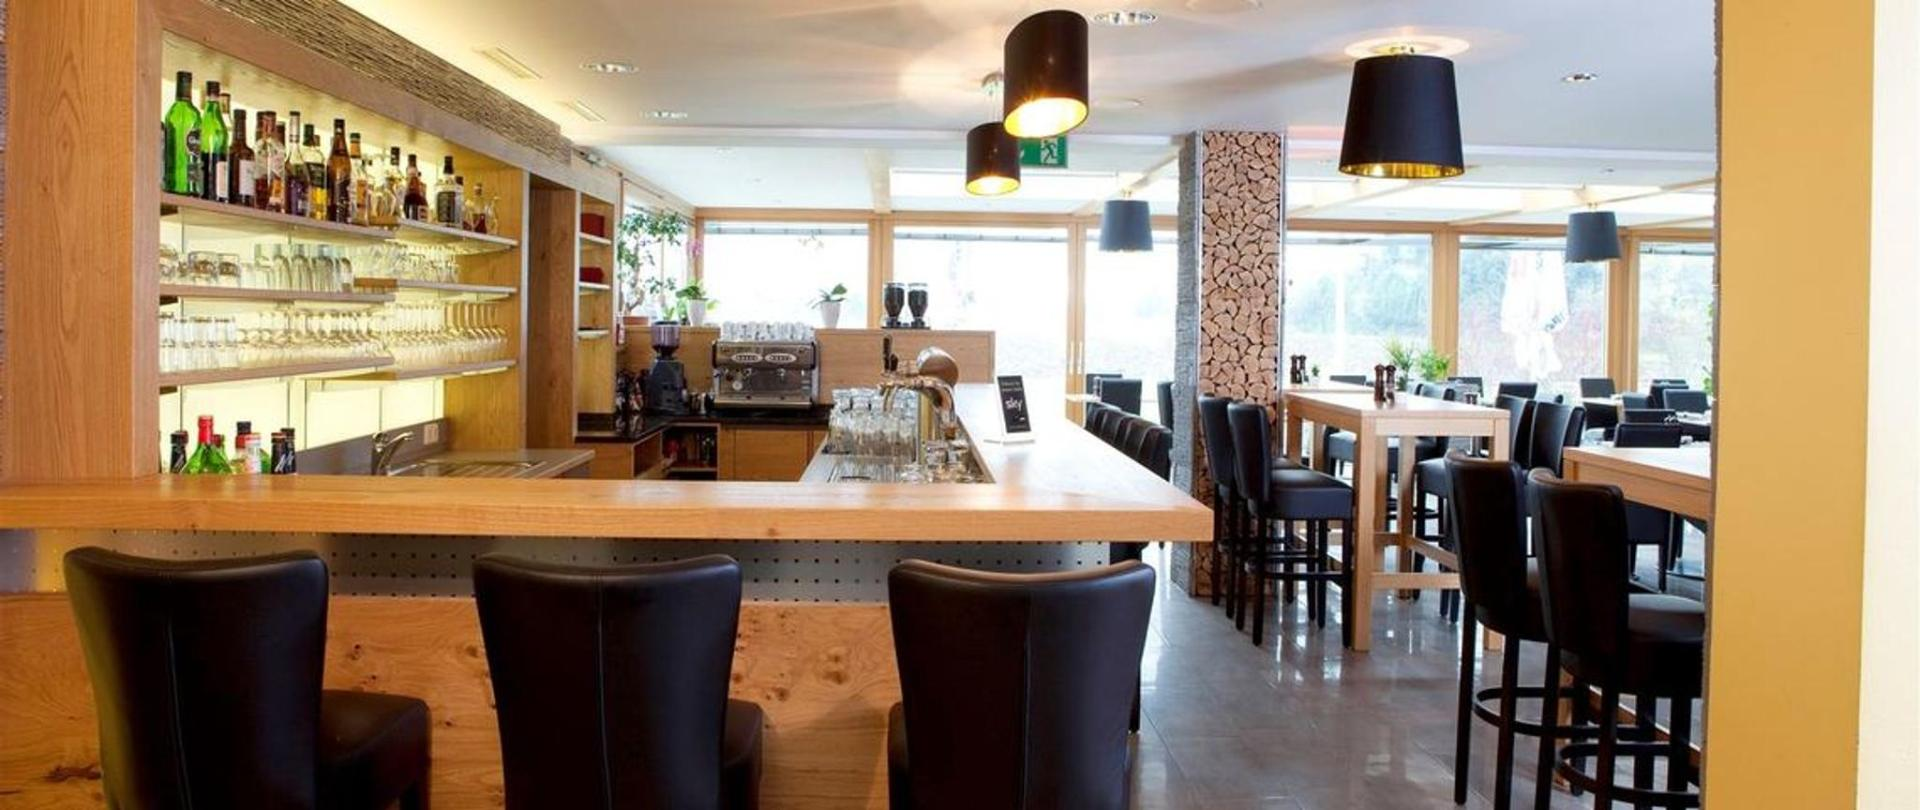 restaurant_bar-kopie.jpg.1140x481_0_185_5937.jpg